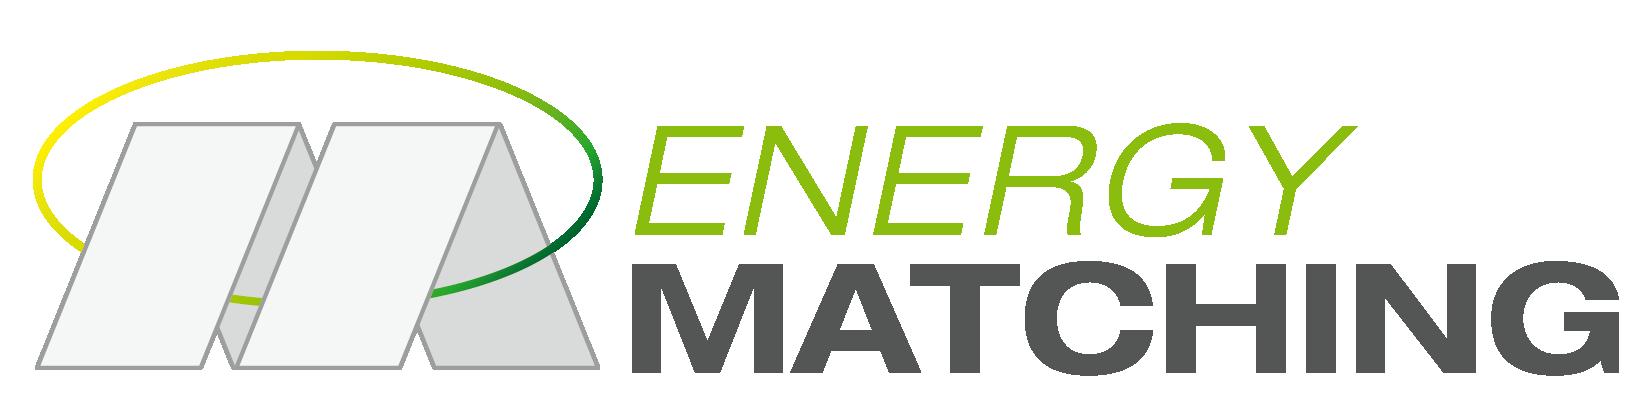 Energy Matching